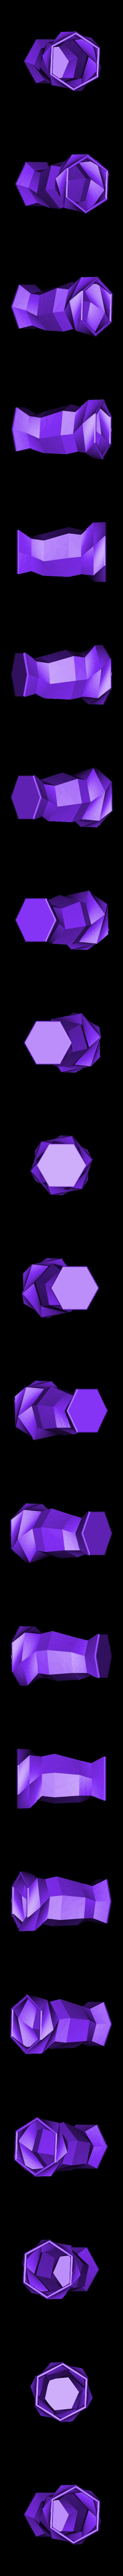 Vase140.stl Download free STL file Vase • Object to 3D print, squiqui